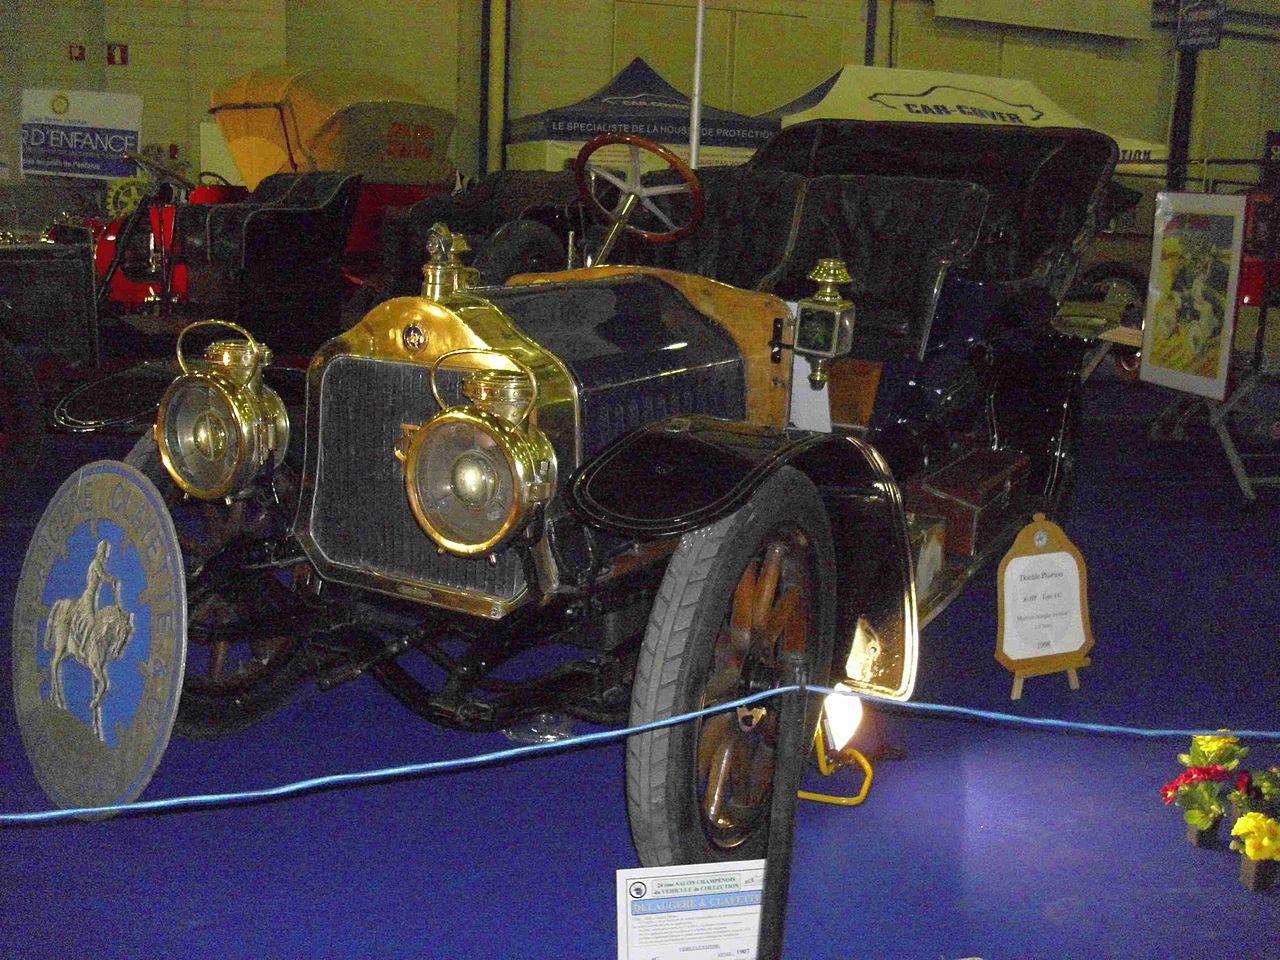 1907-Delaugere-Clayette-4G-doppelphaeton